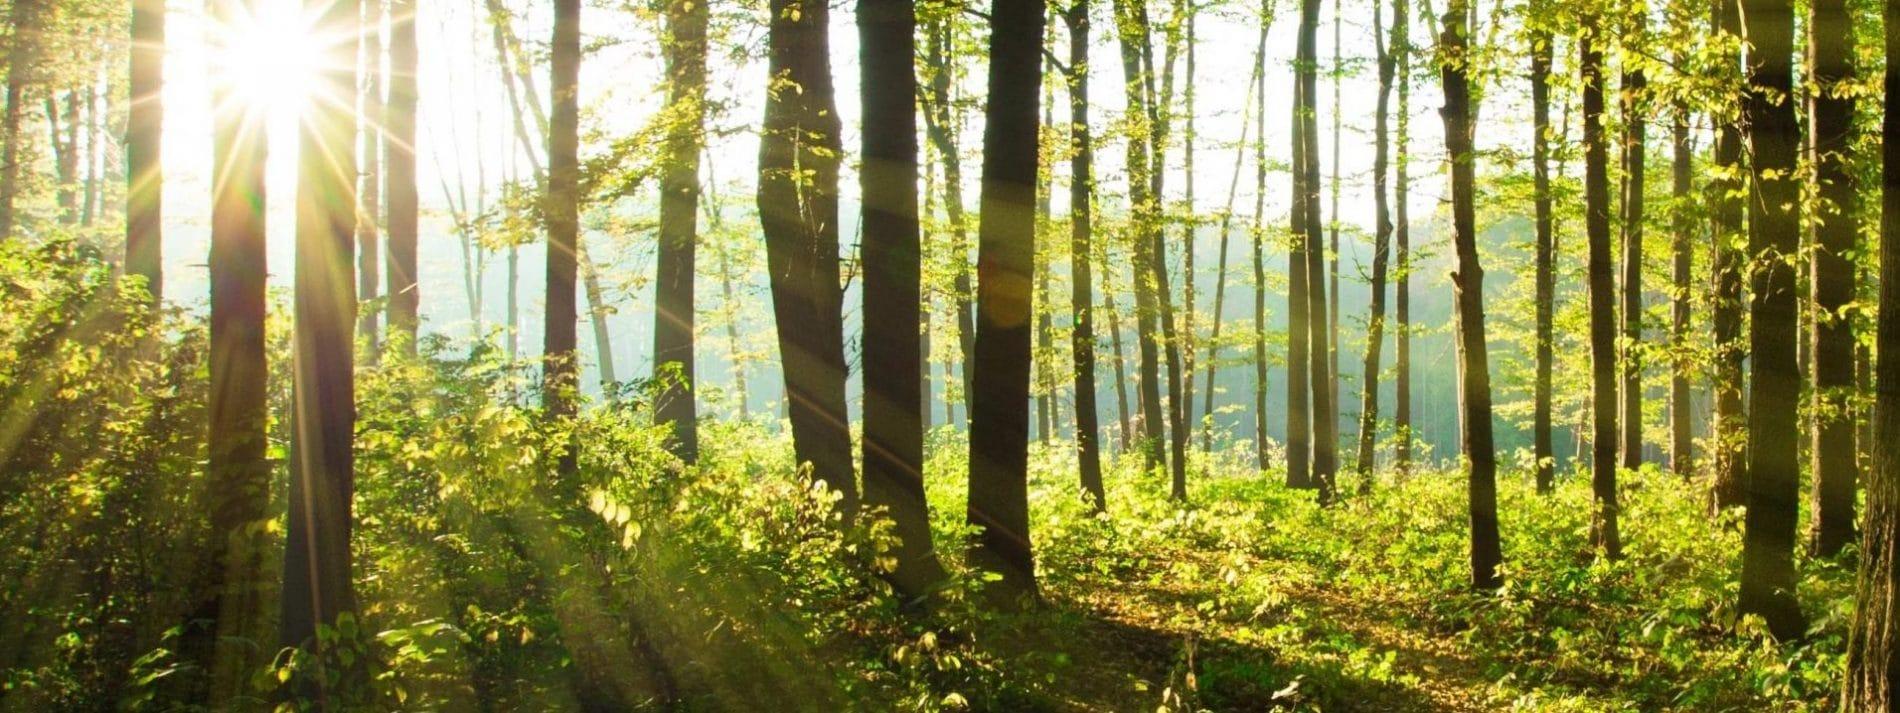 biodiversité nature foret cidou